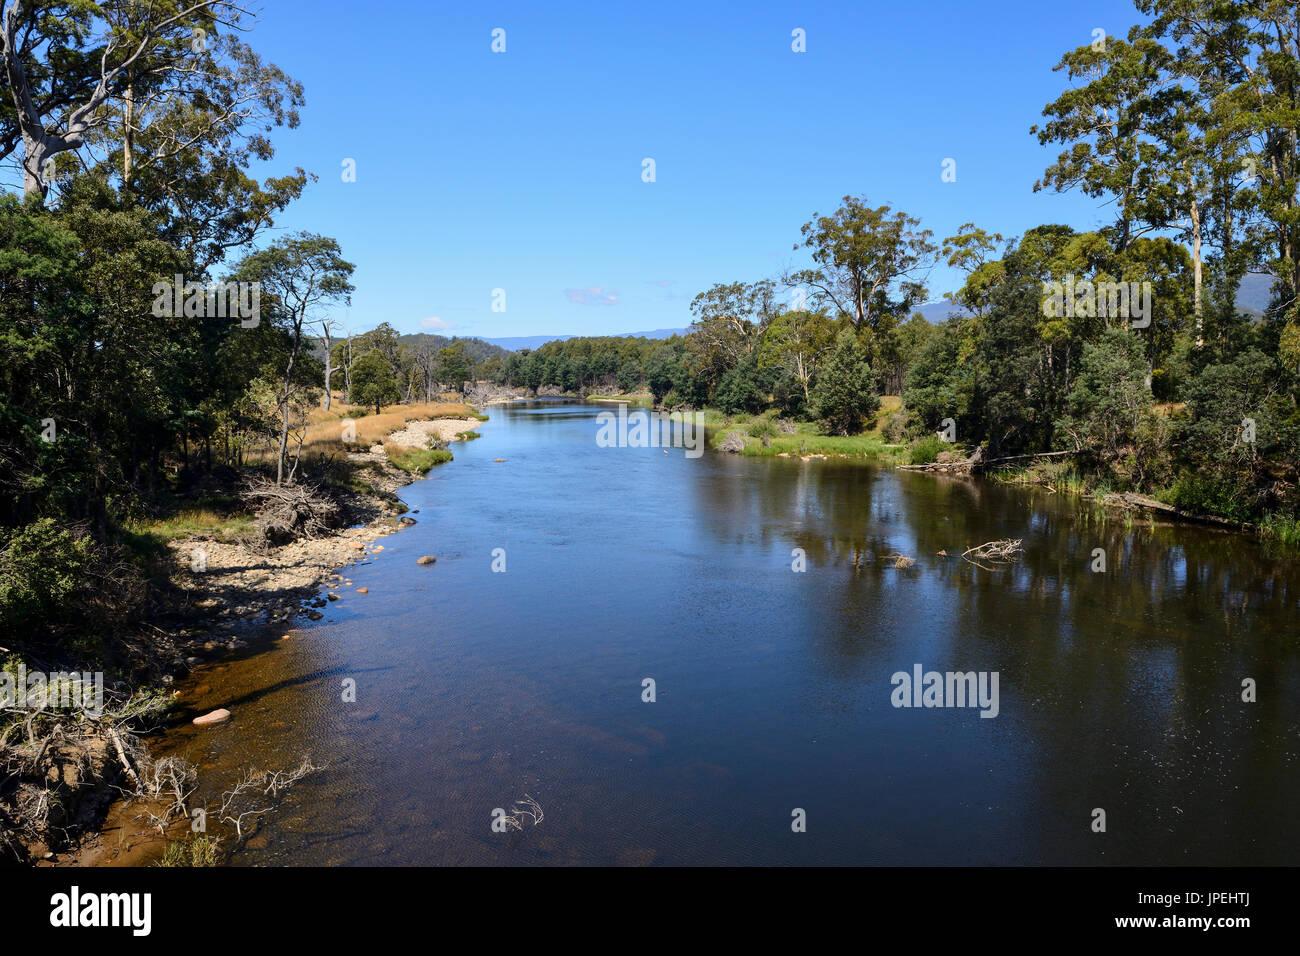 View of Mersey River from trestle bridge on Liena Road in Northern Tasmania, Australia - Stock Image